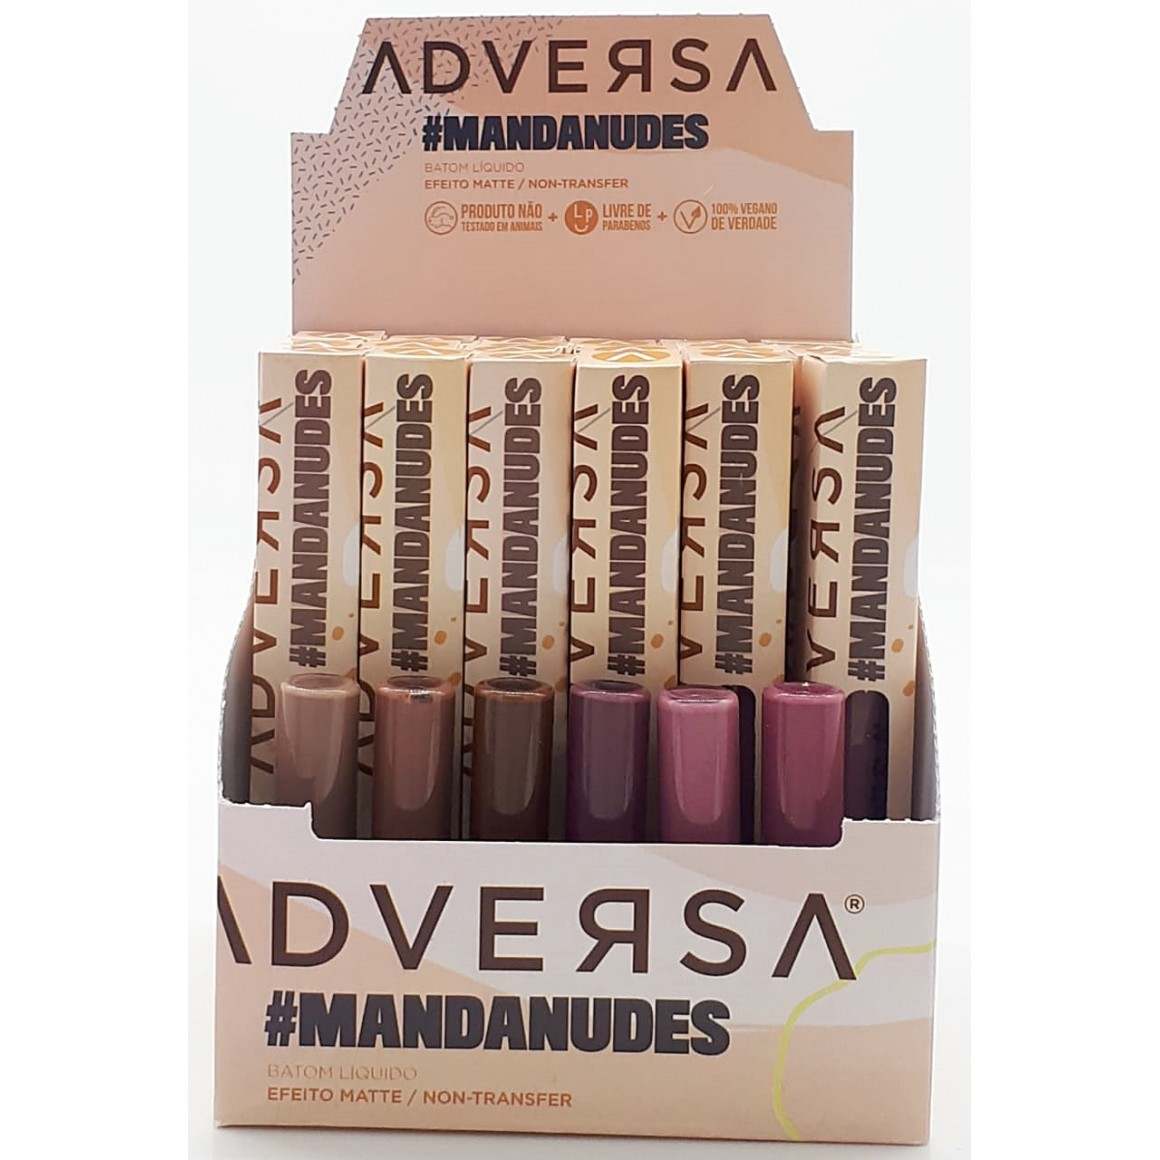 Batom Líquido Efeito Matte Manda Nudes - Adversa (AD301)